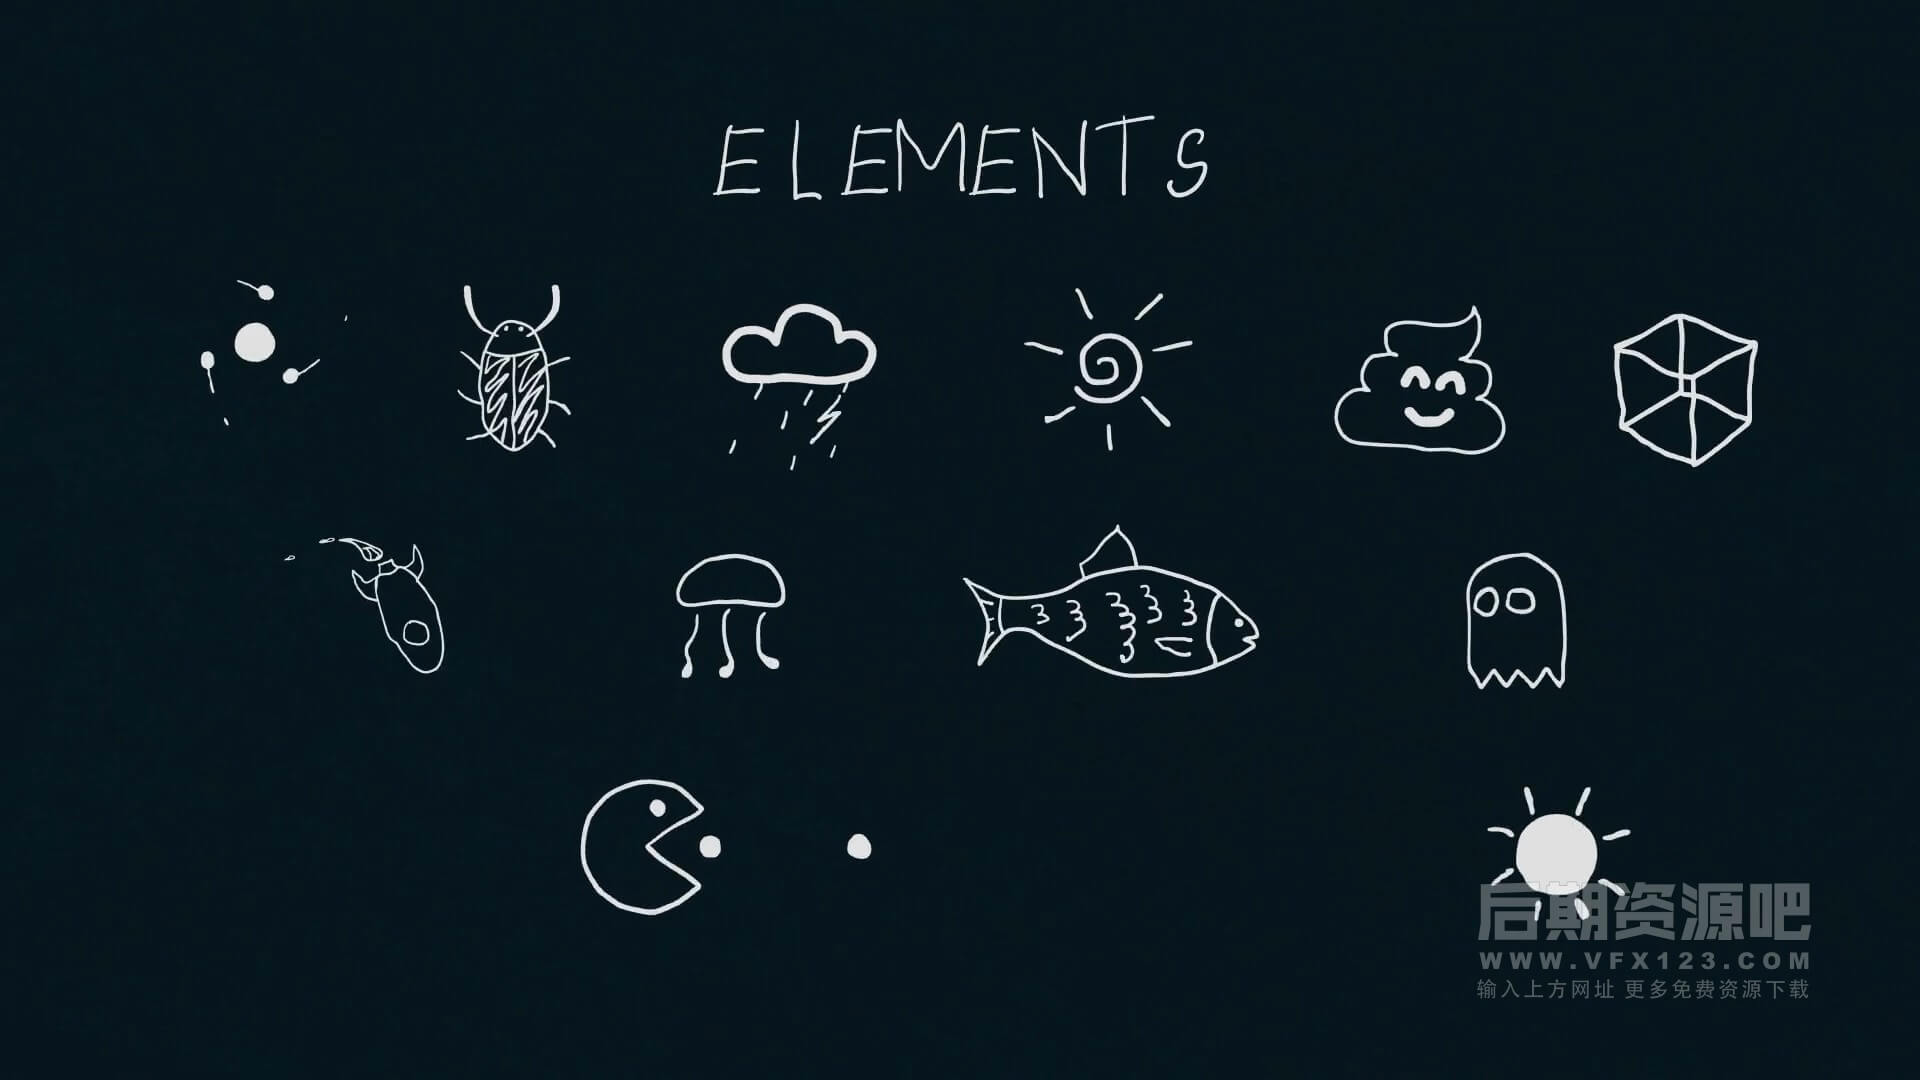 AE模板 有趣手绘英文数字符号动画元素 Alphabet Elements